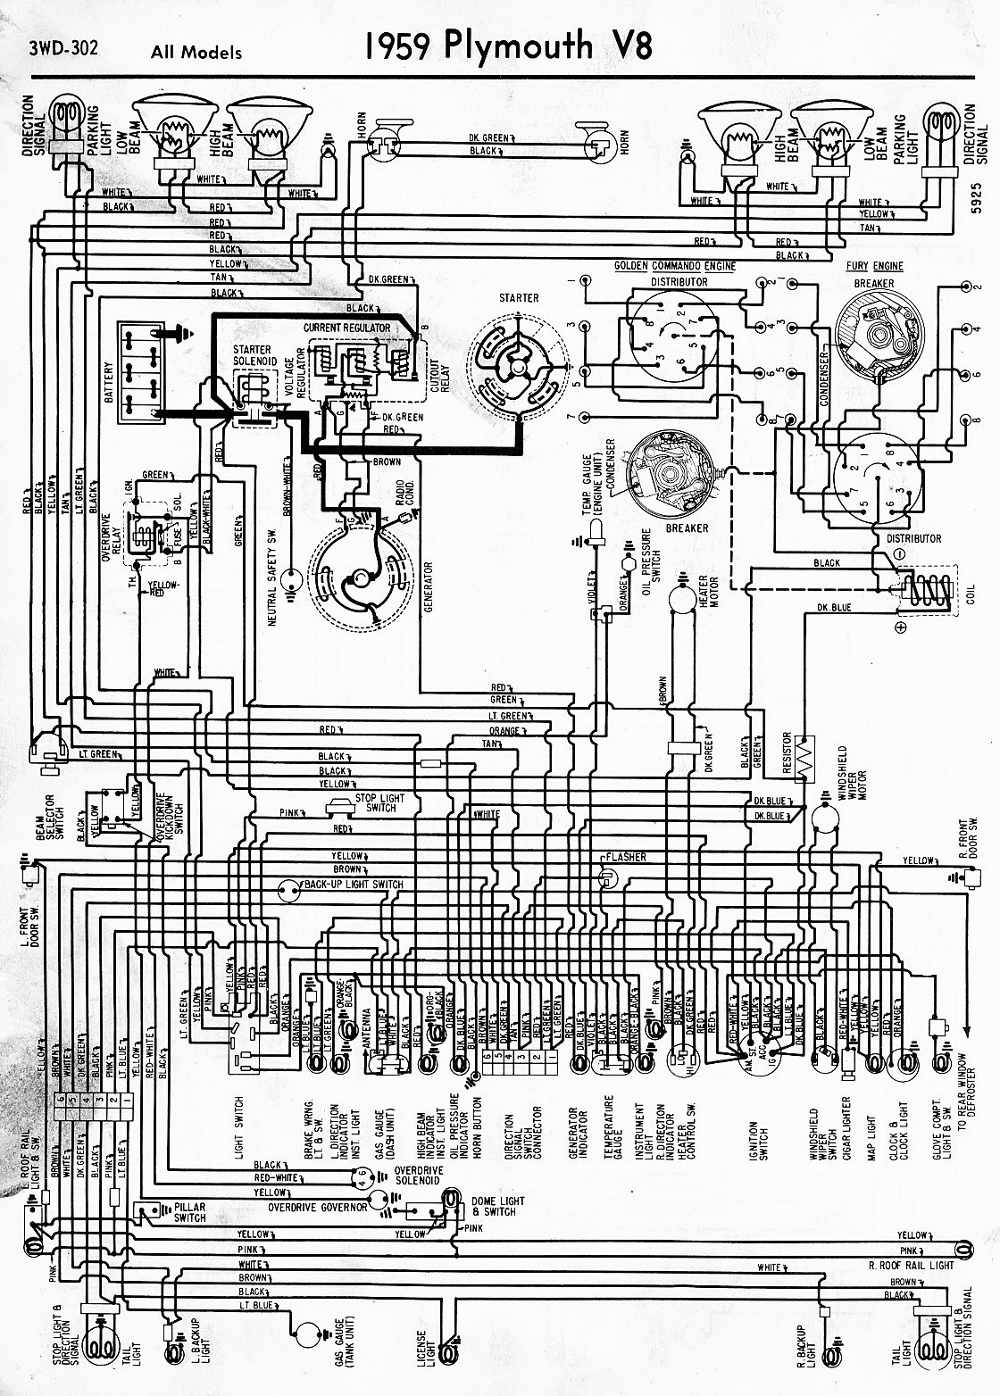 Lexus V8 Alternator Wiring Diagram – Lexus Sc300 Wiring Diagram Light